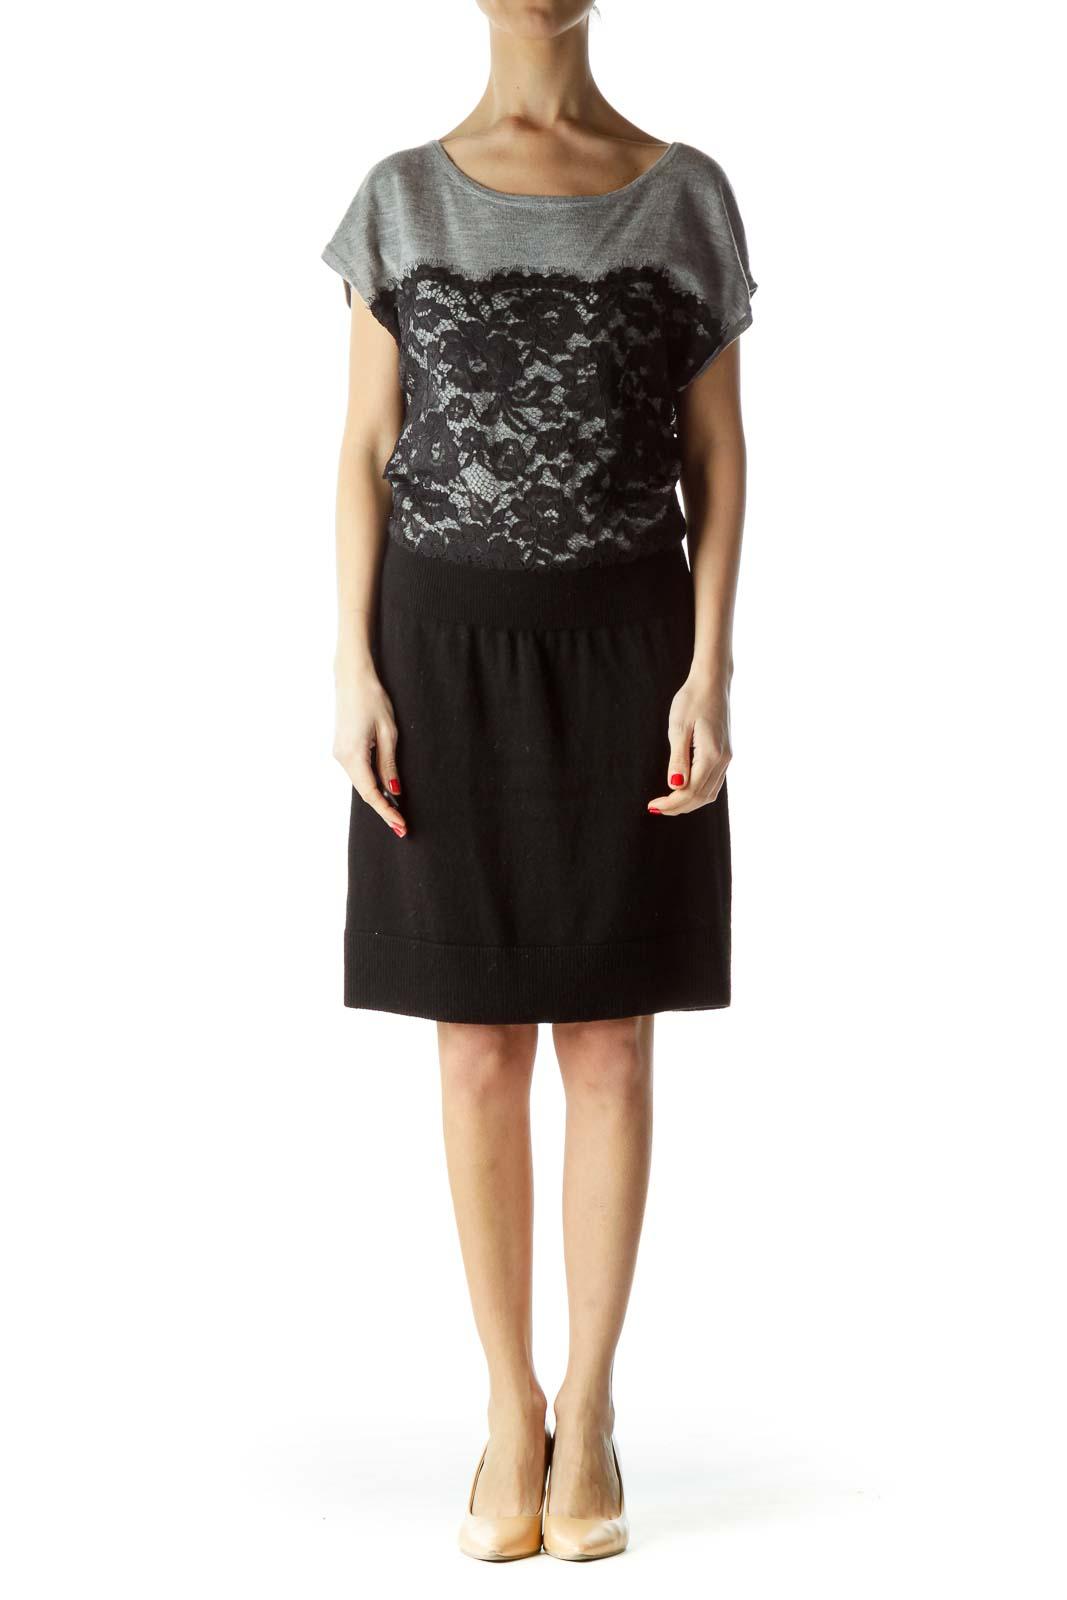 Gray Black Lace Knit Dress